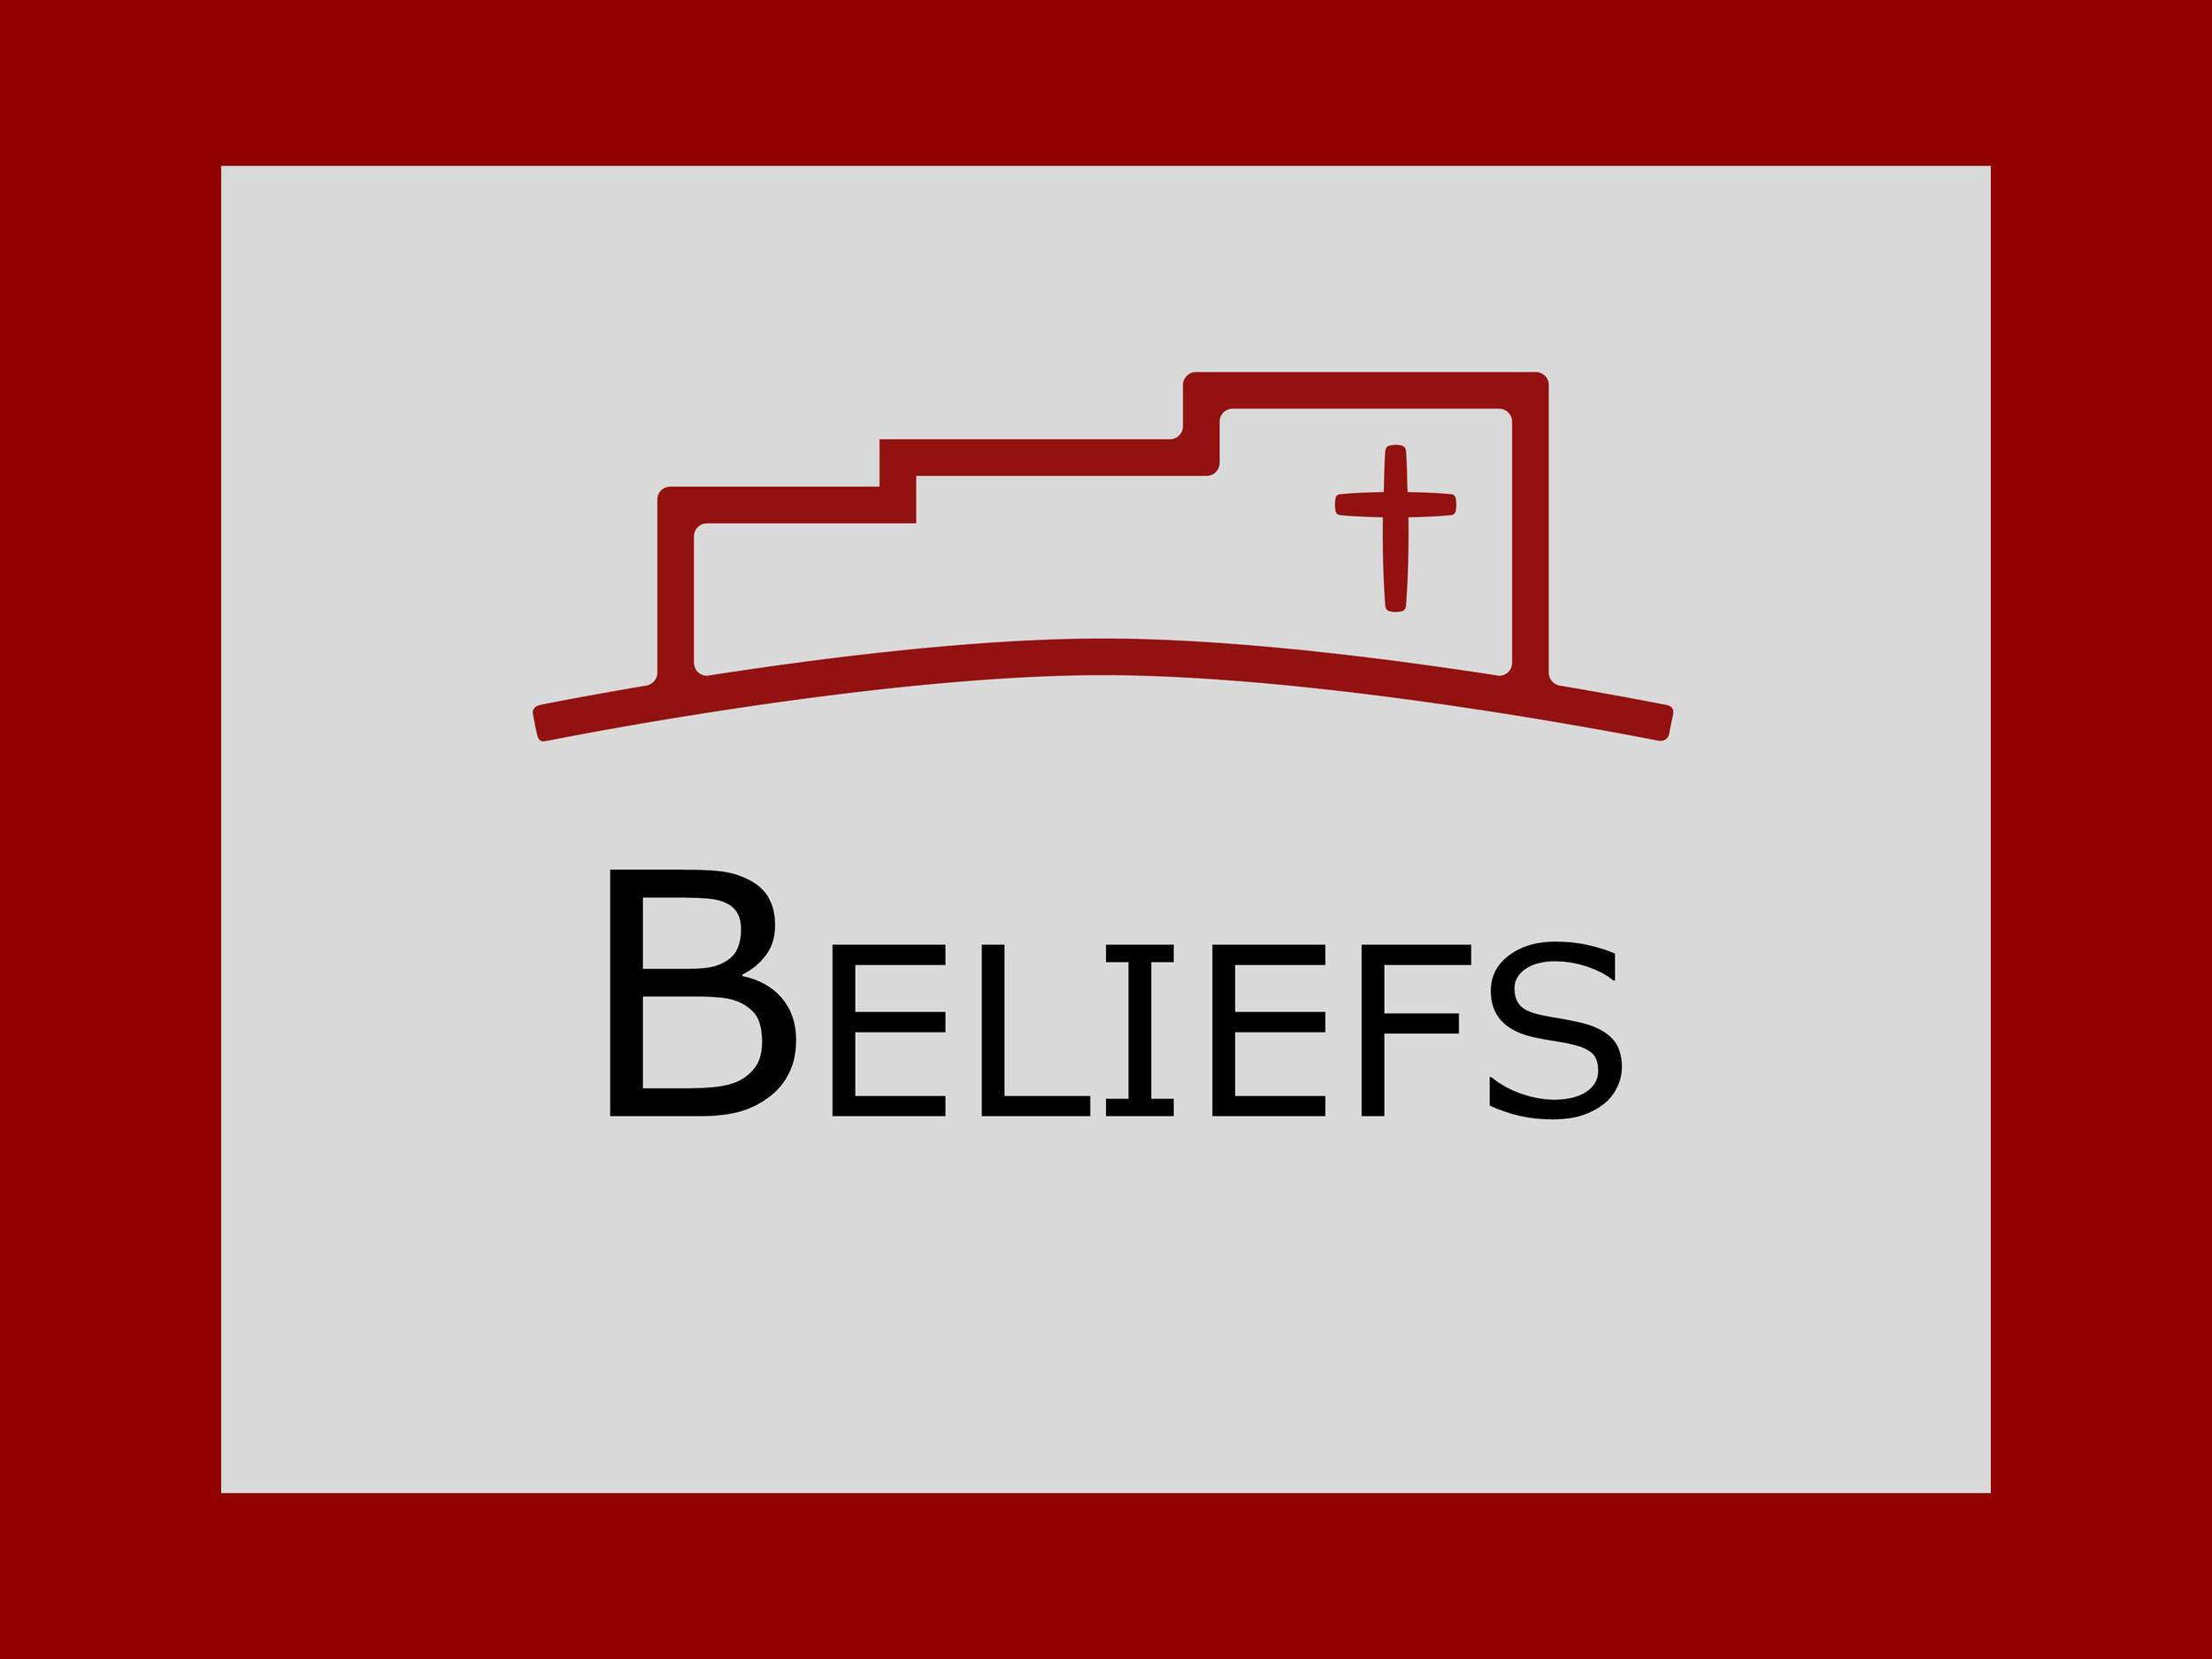 Belief-WR.jpg